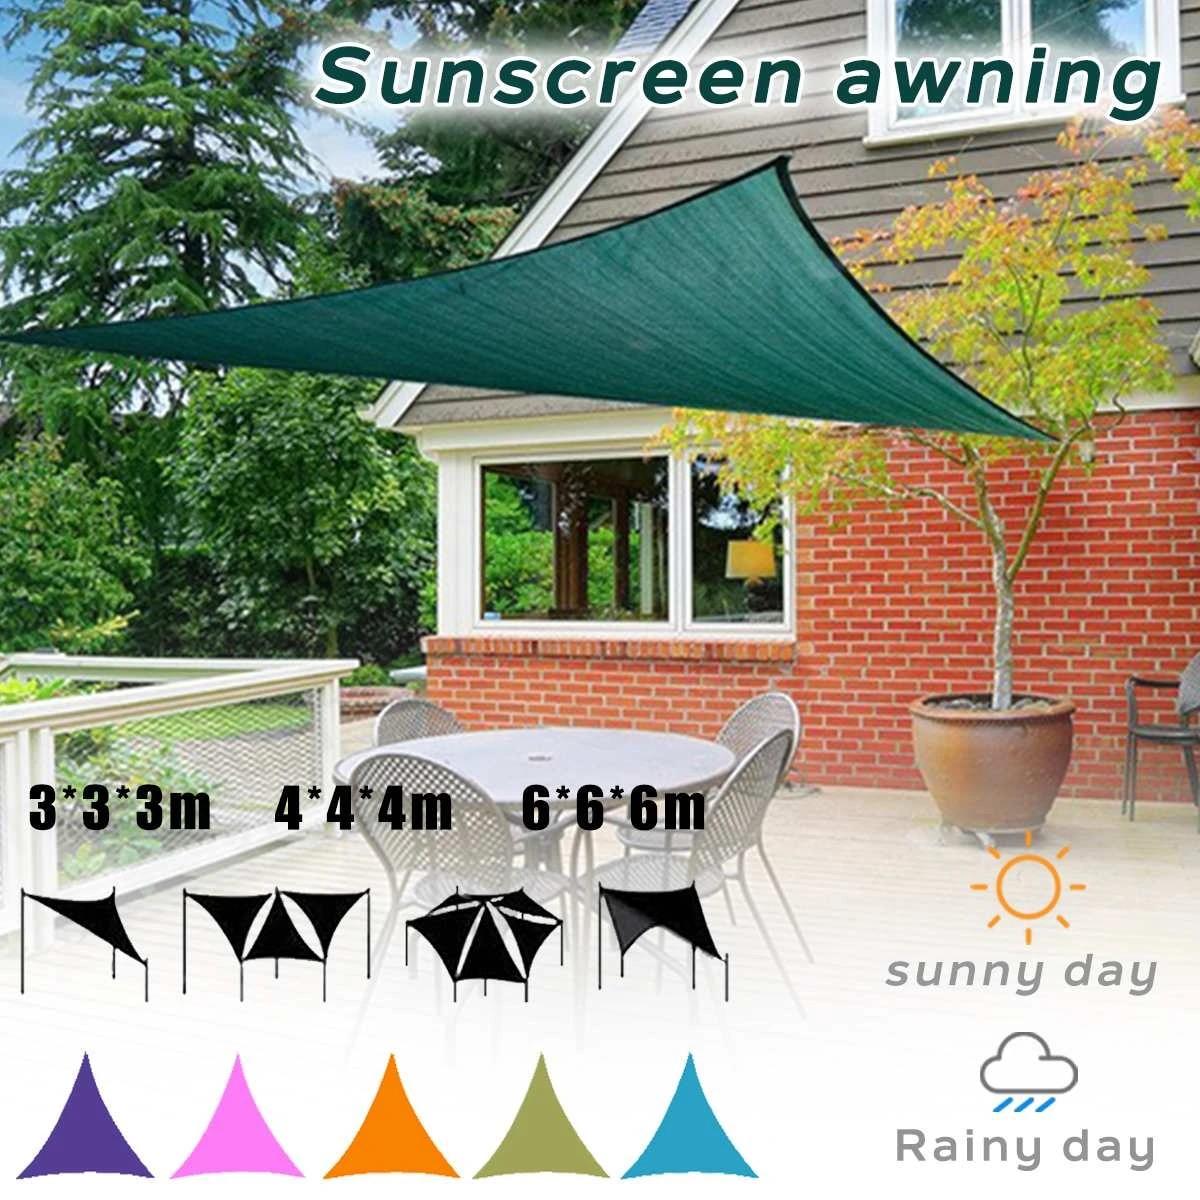 waterproof triangle awning shade sail sun outdoor waterproof sun shade sail garden patio pool camping picnic tent